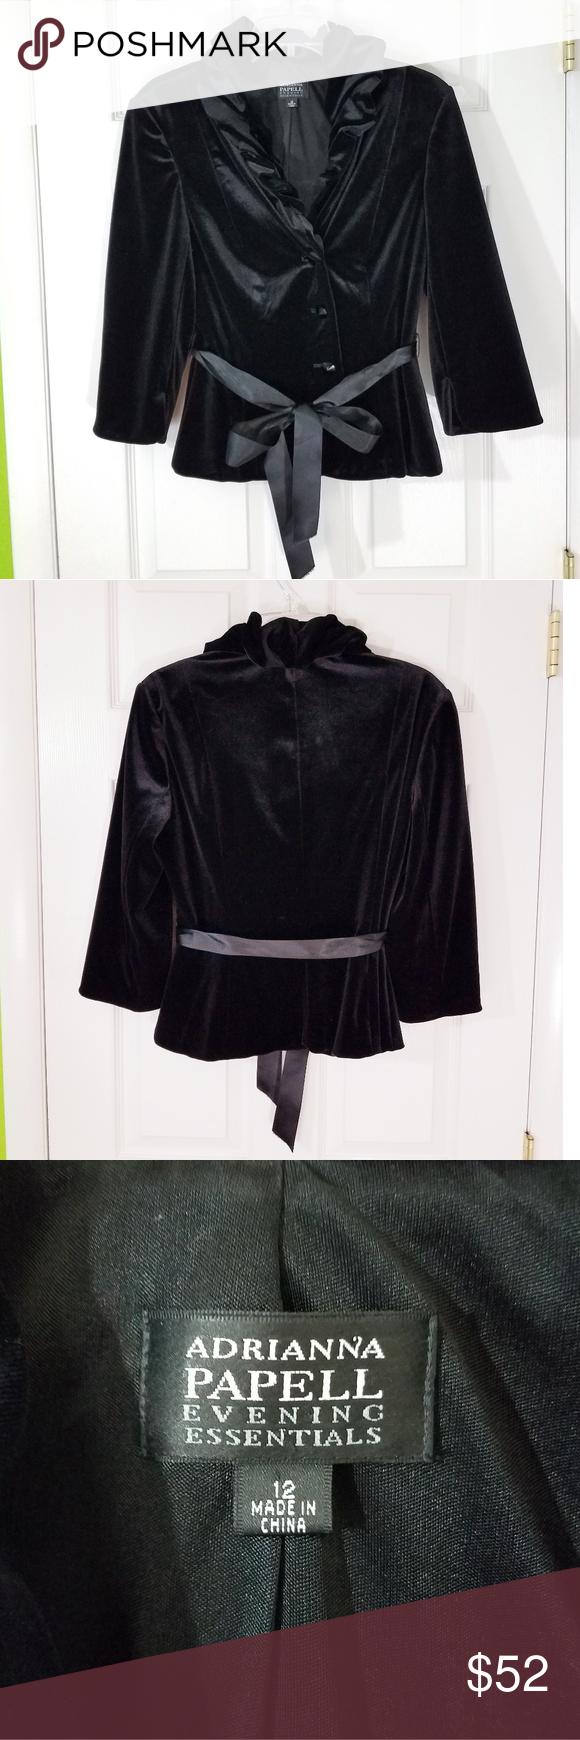 Adrianna Papell Velvet Jacket